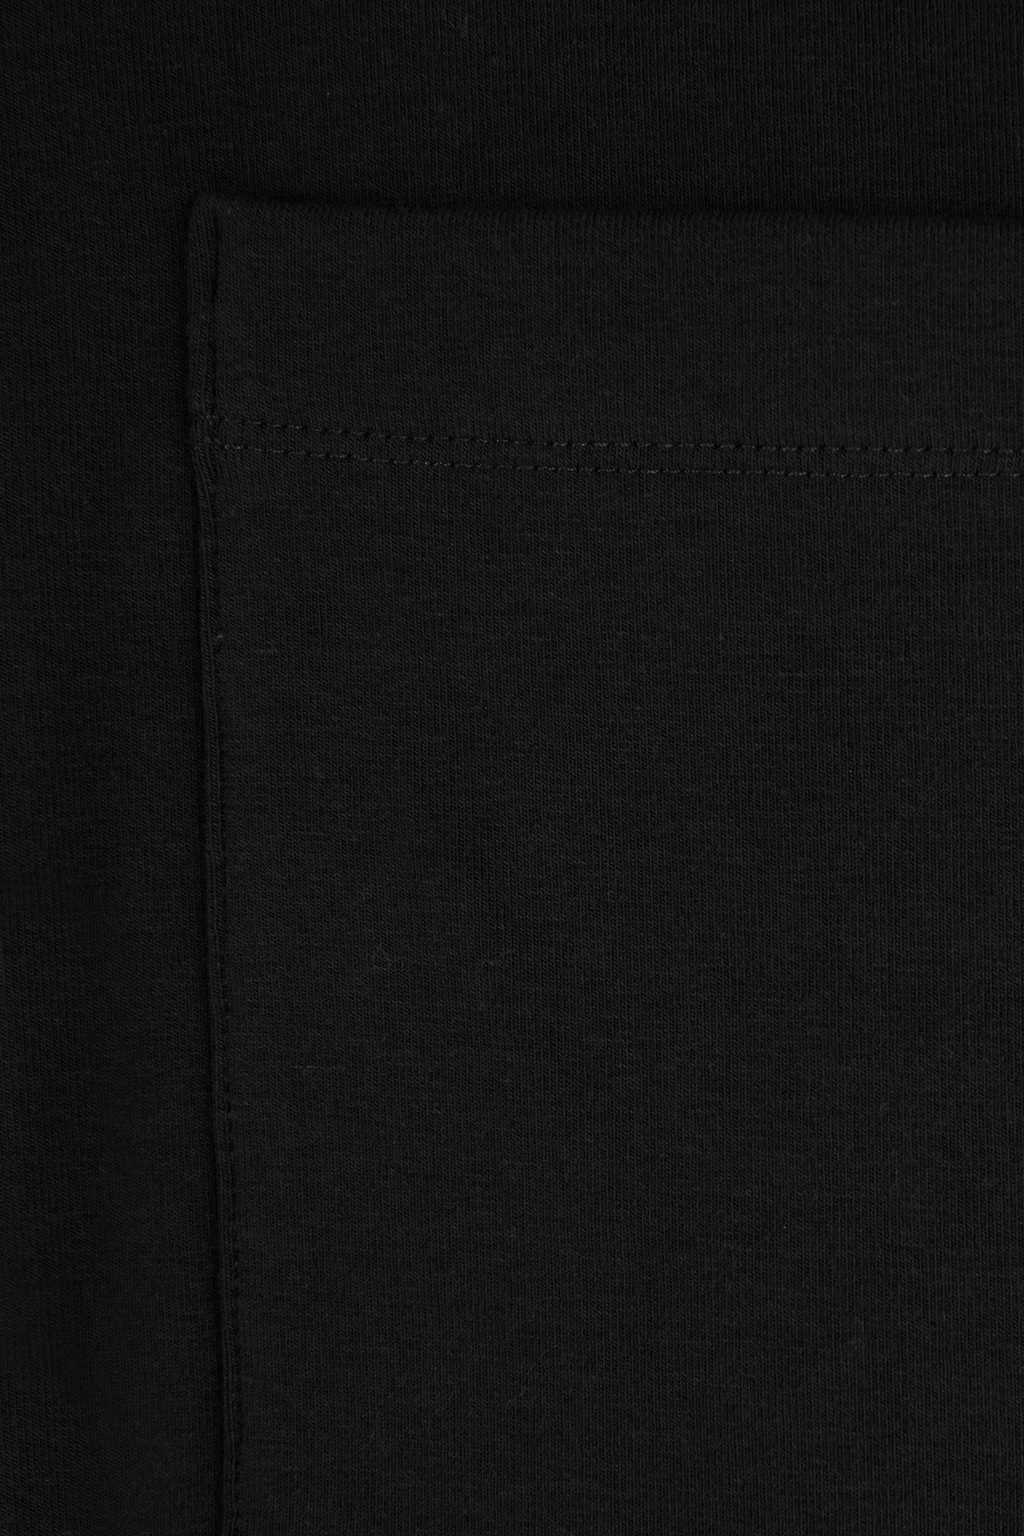 Sweatshirt 2968 Black 9